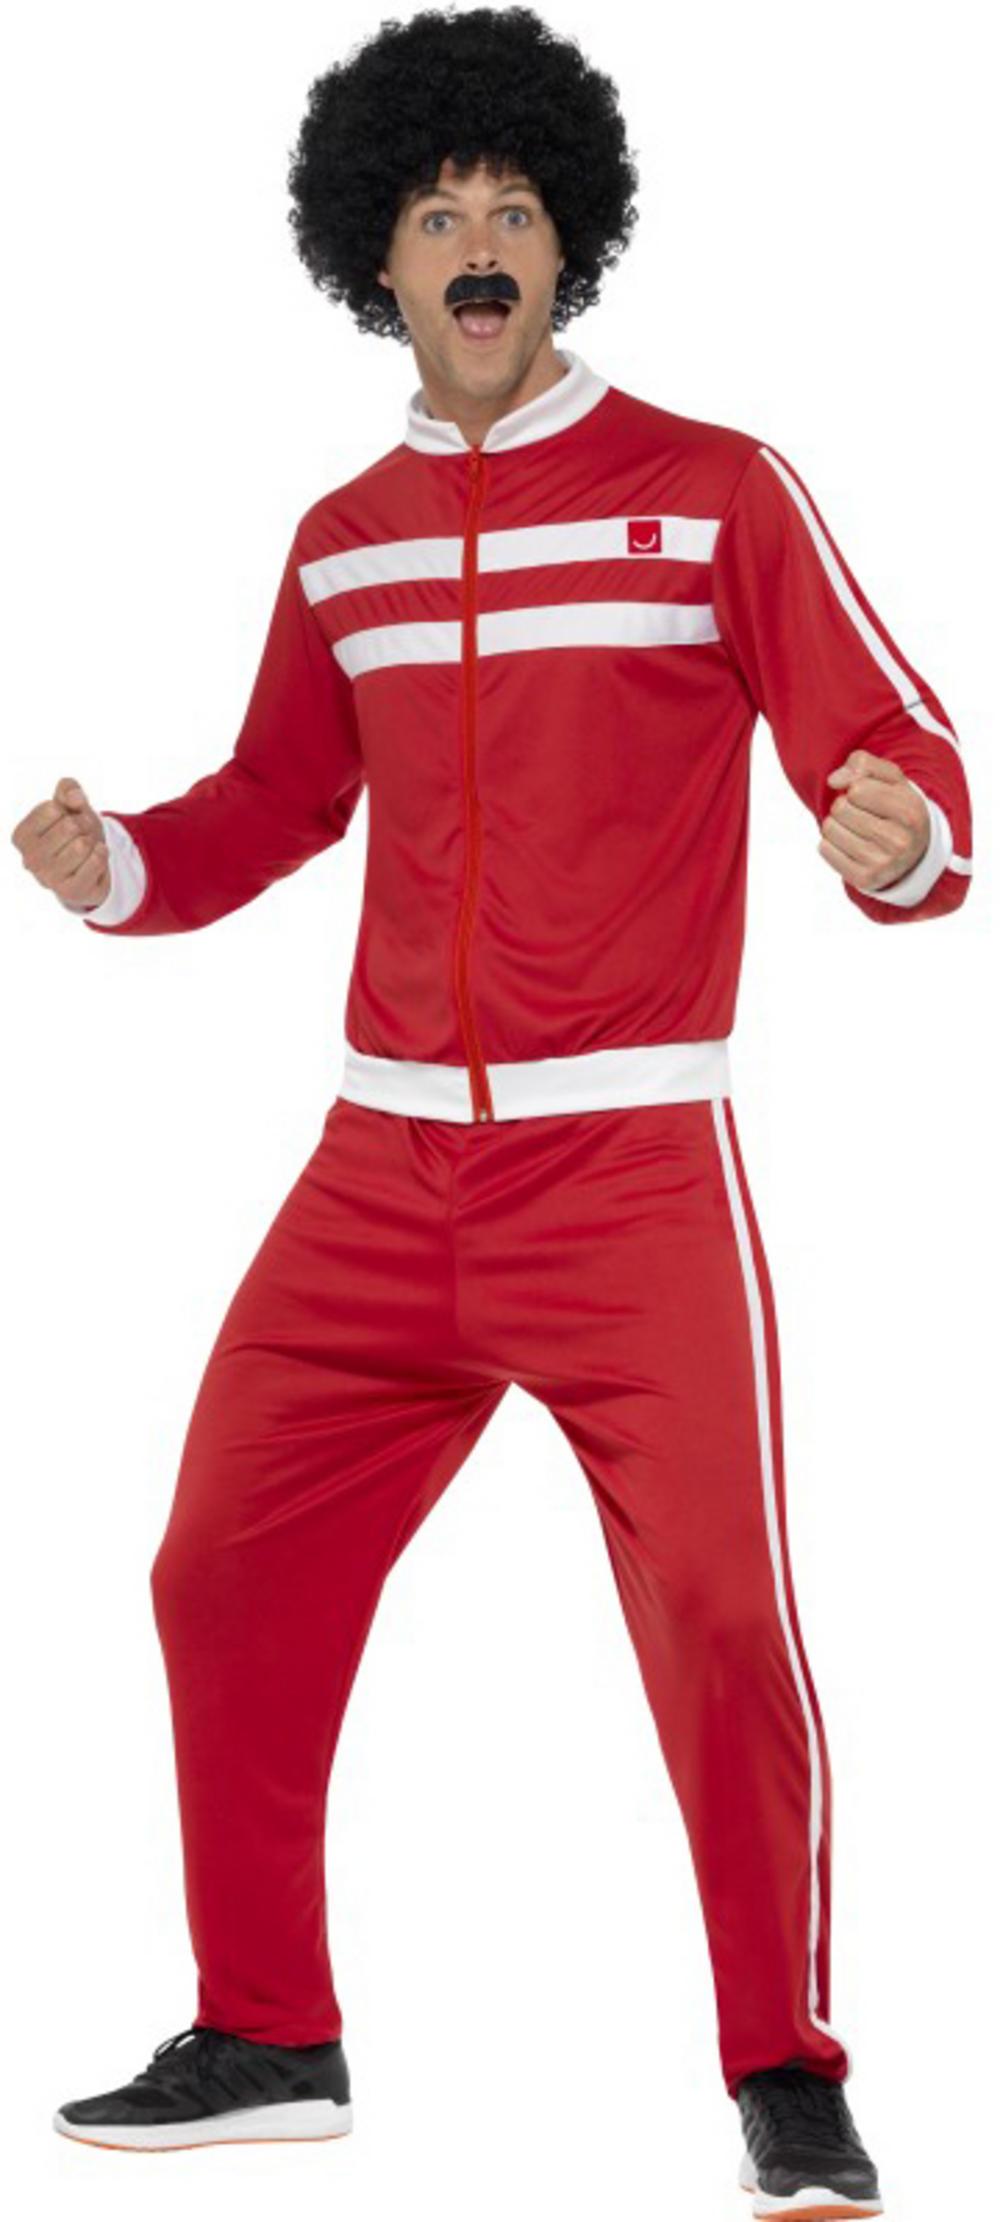 Scouser Tracksuit Mens Costume